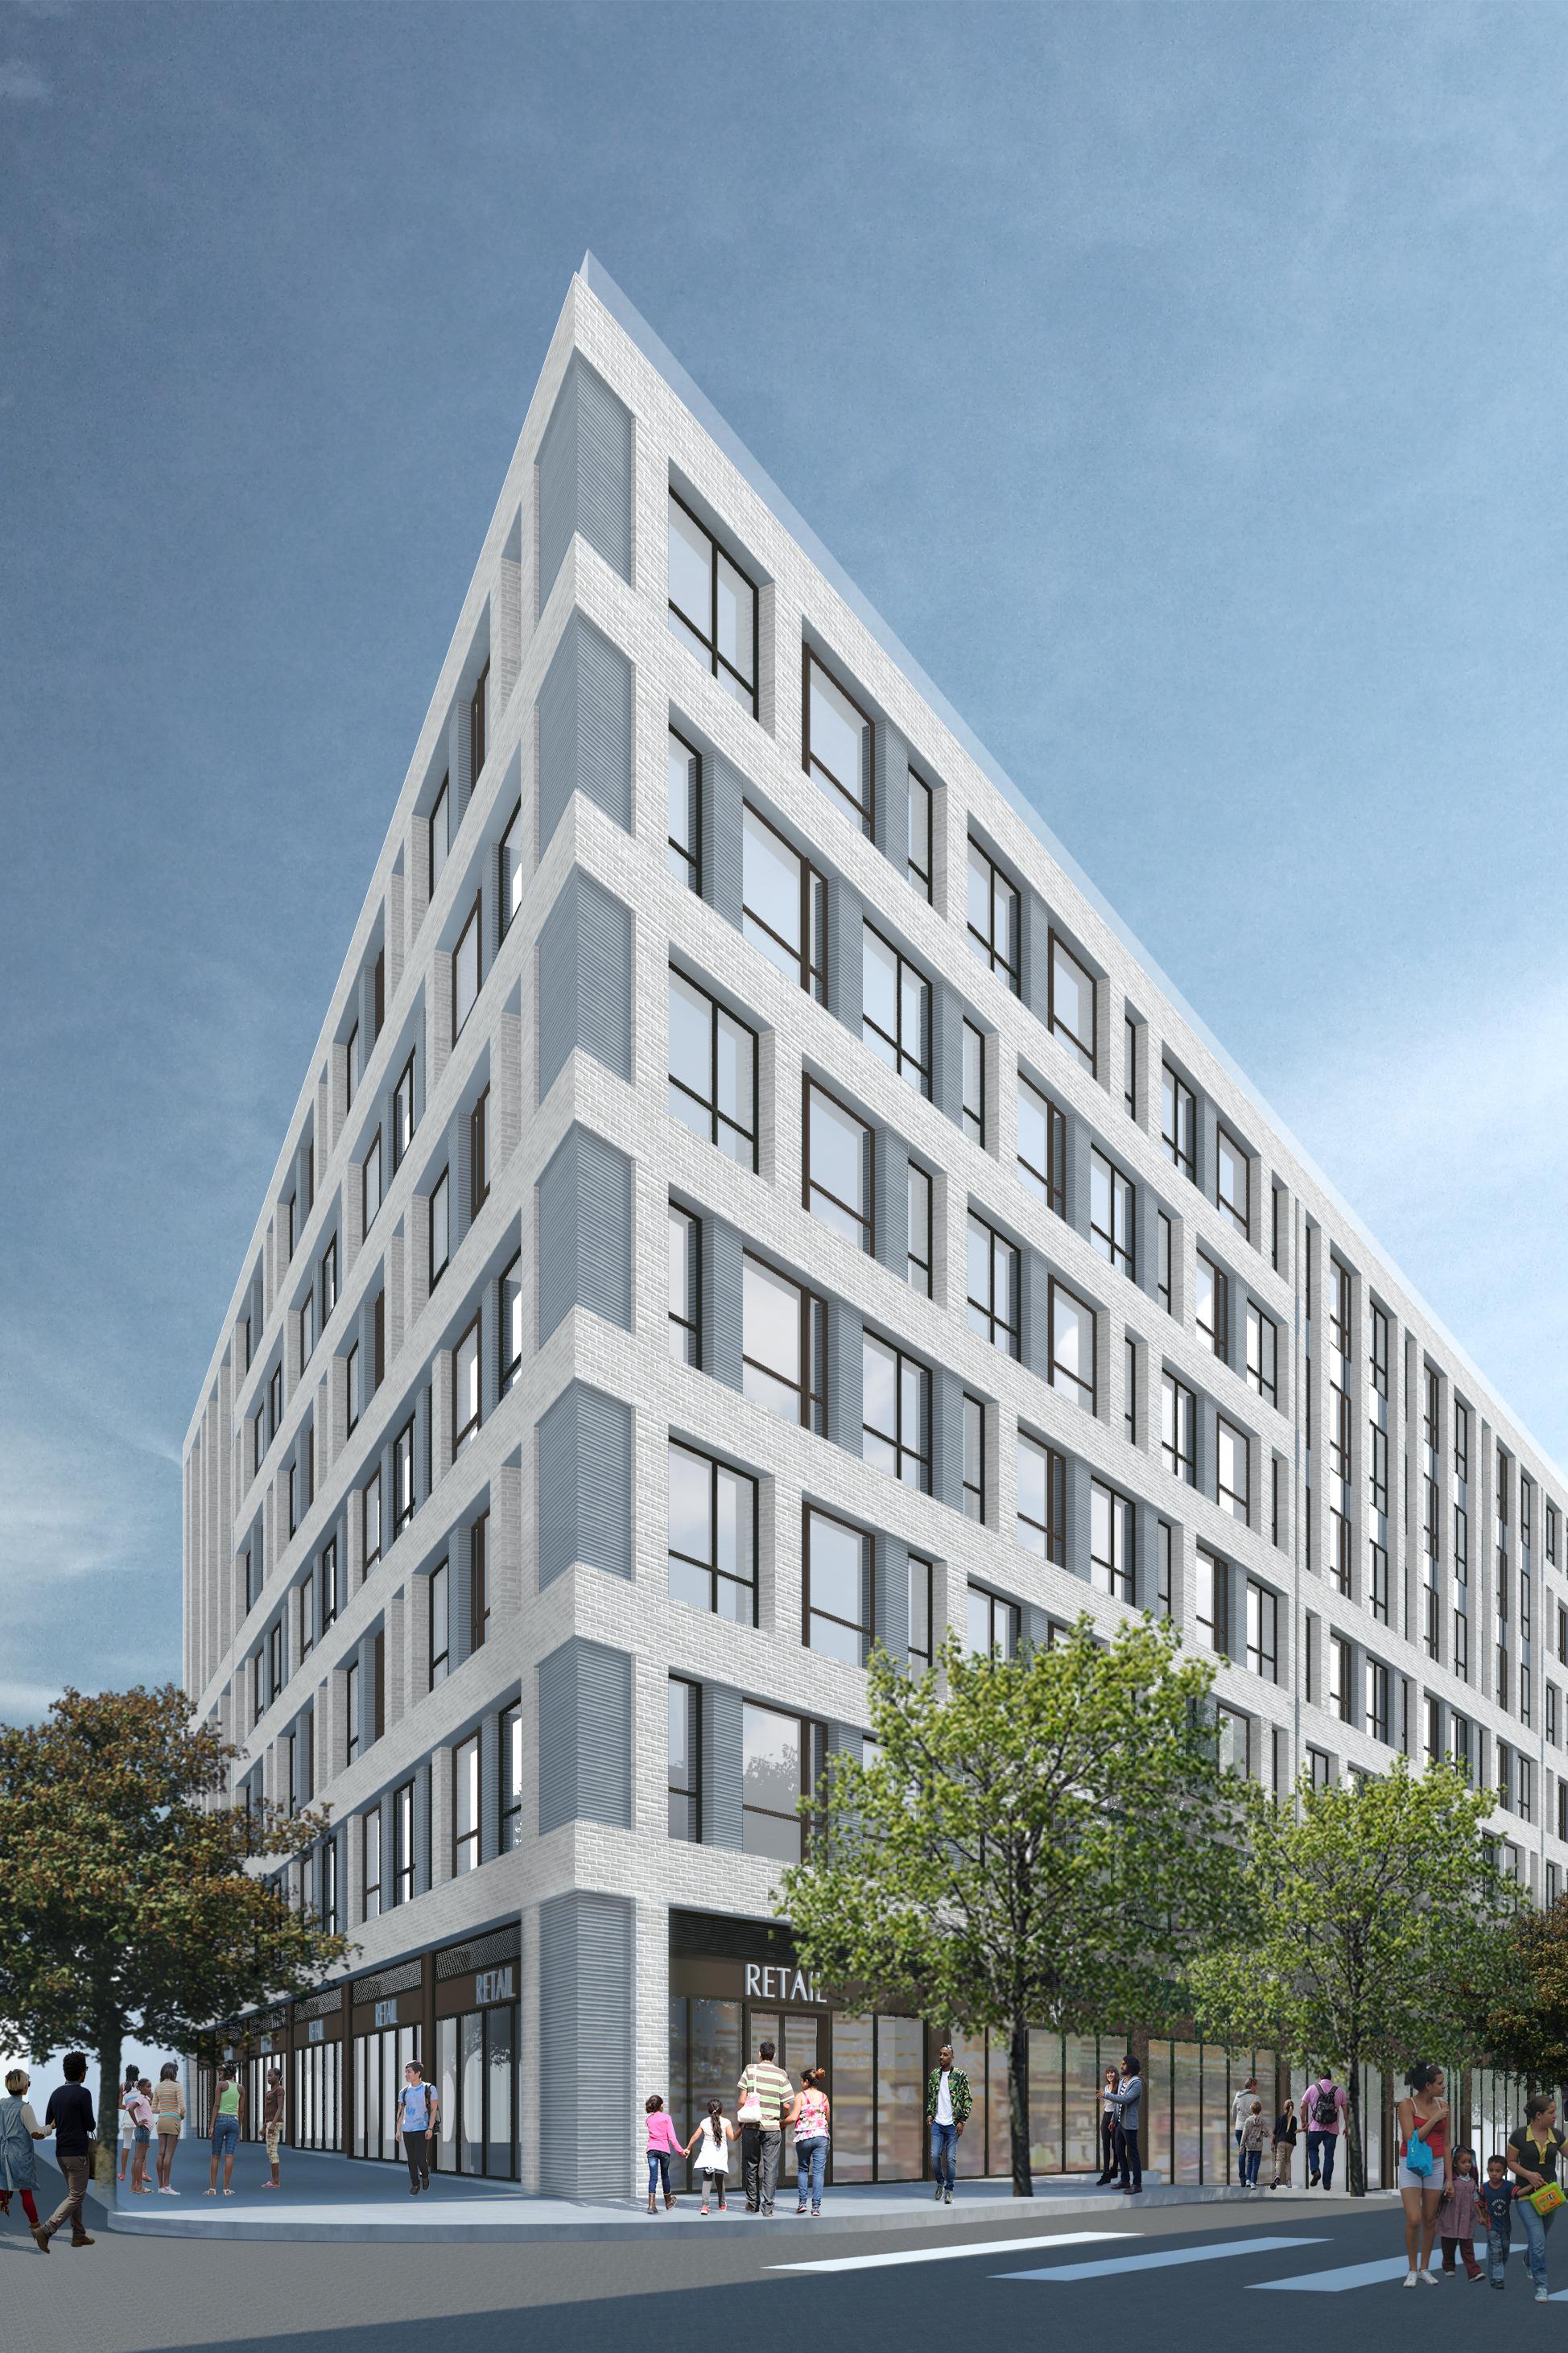 980 Westchester Avenue, rendering courtesy GF55 Parnters